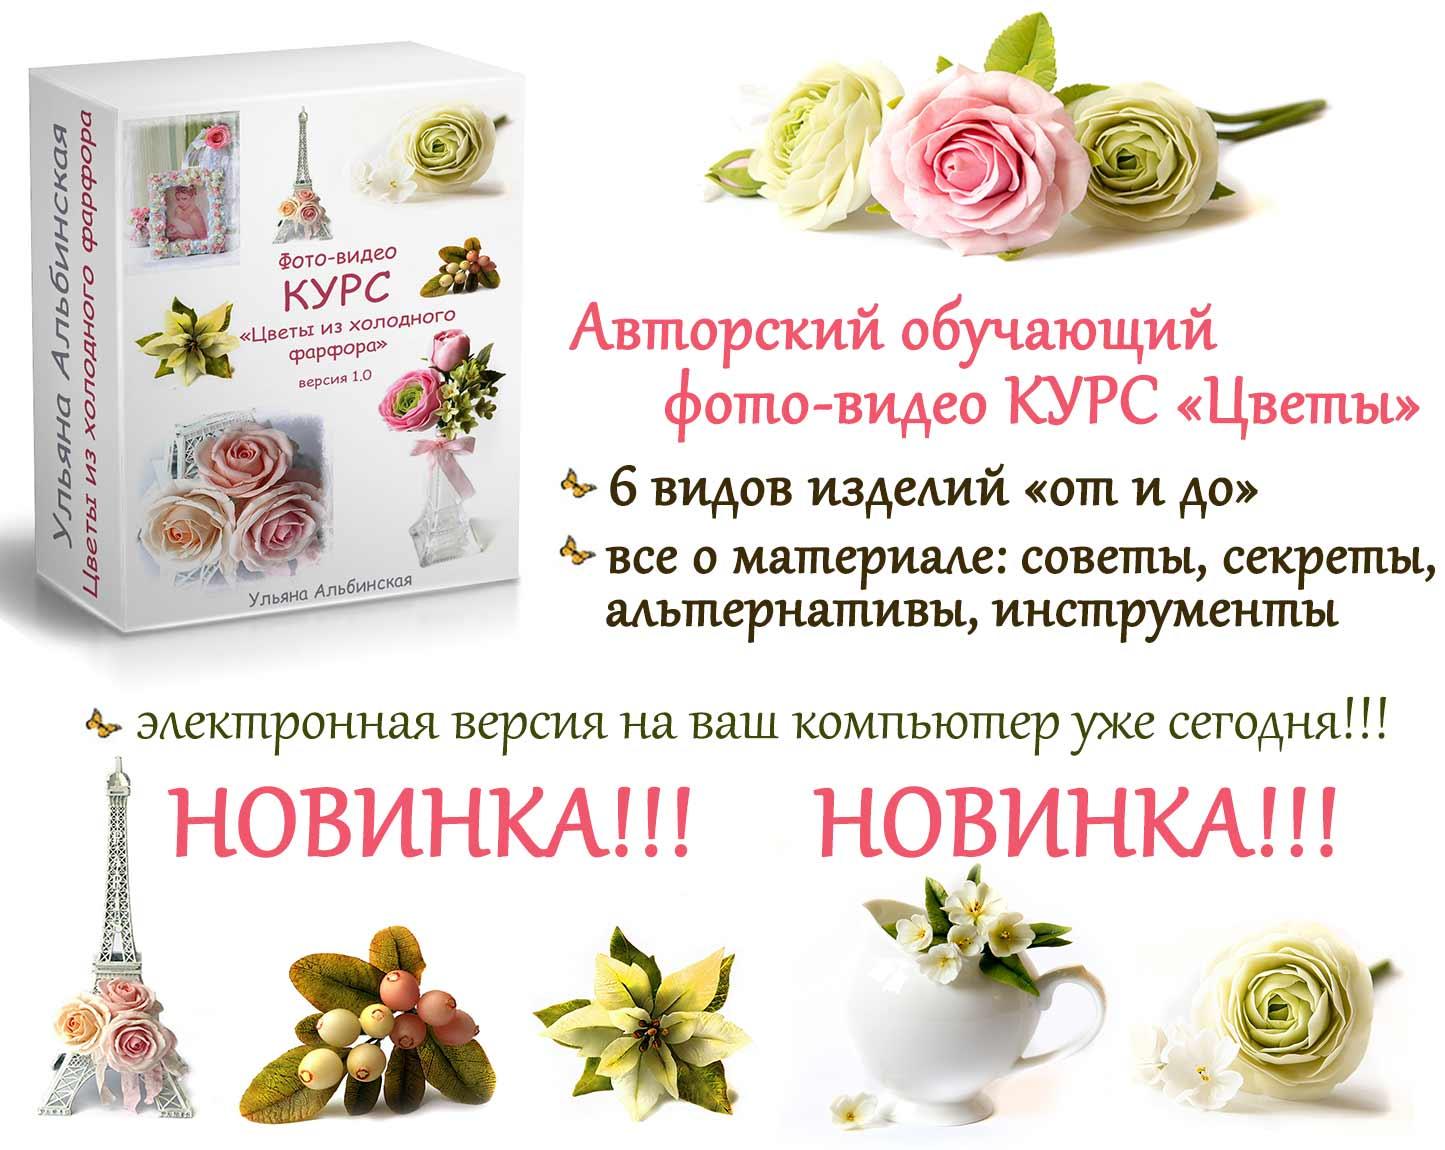 http://albinskaya.blogspot.com/p/sale.html